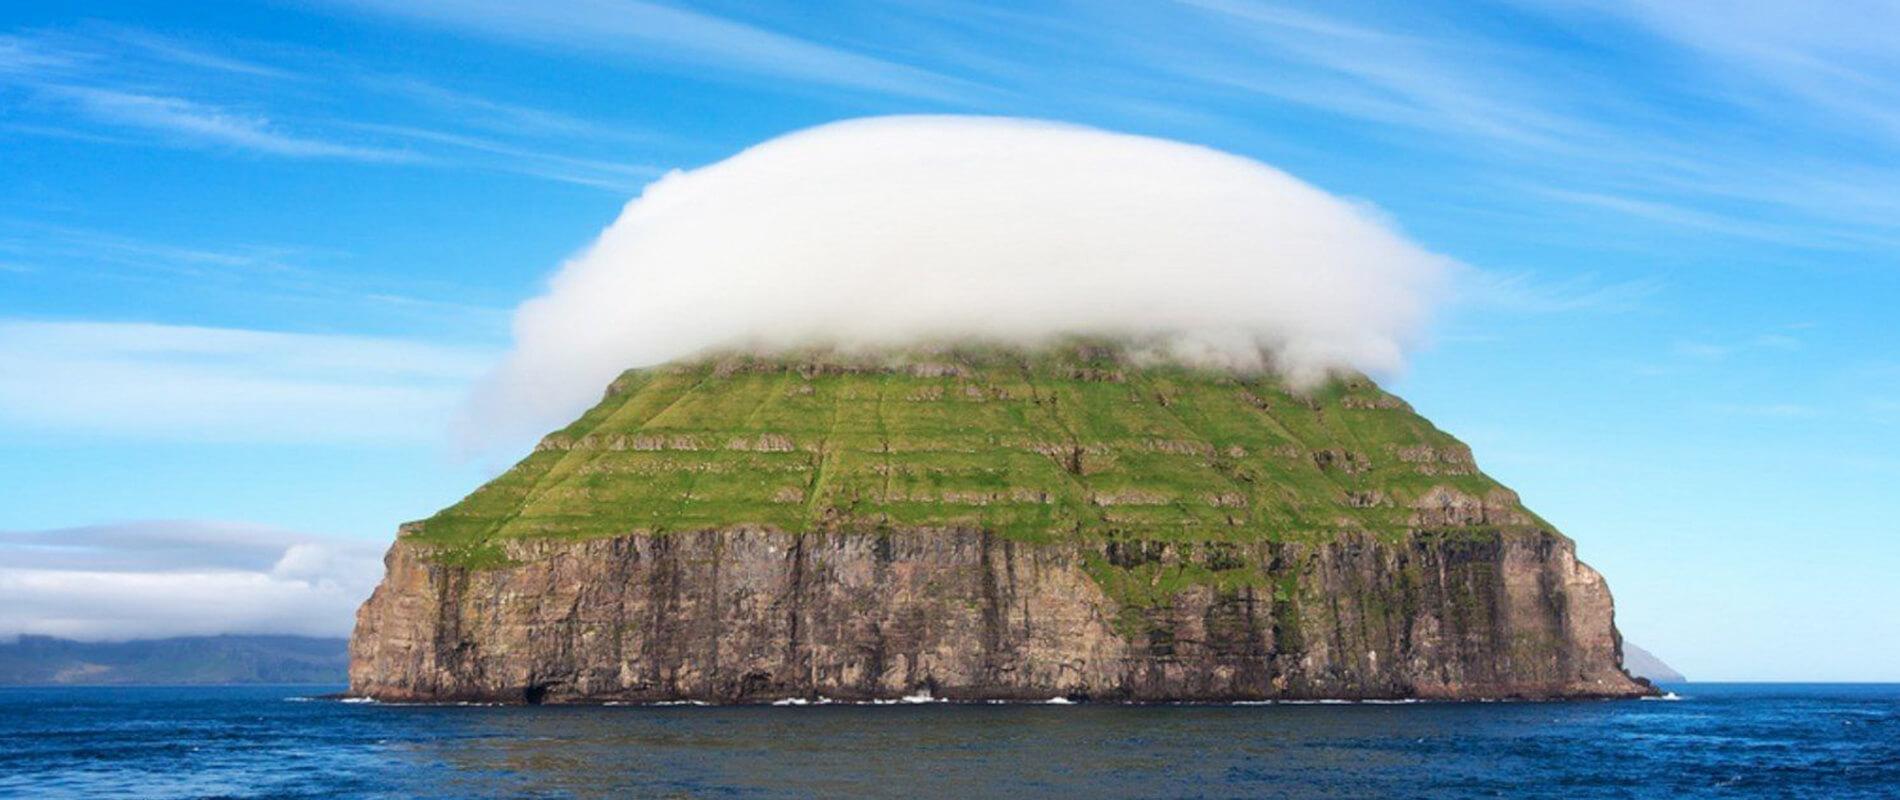 Lítla Dímun, l'isoletta avvolta da una soffice nuvola